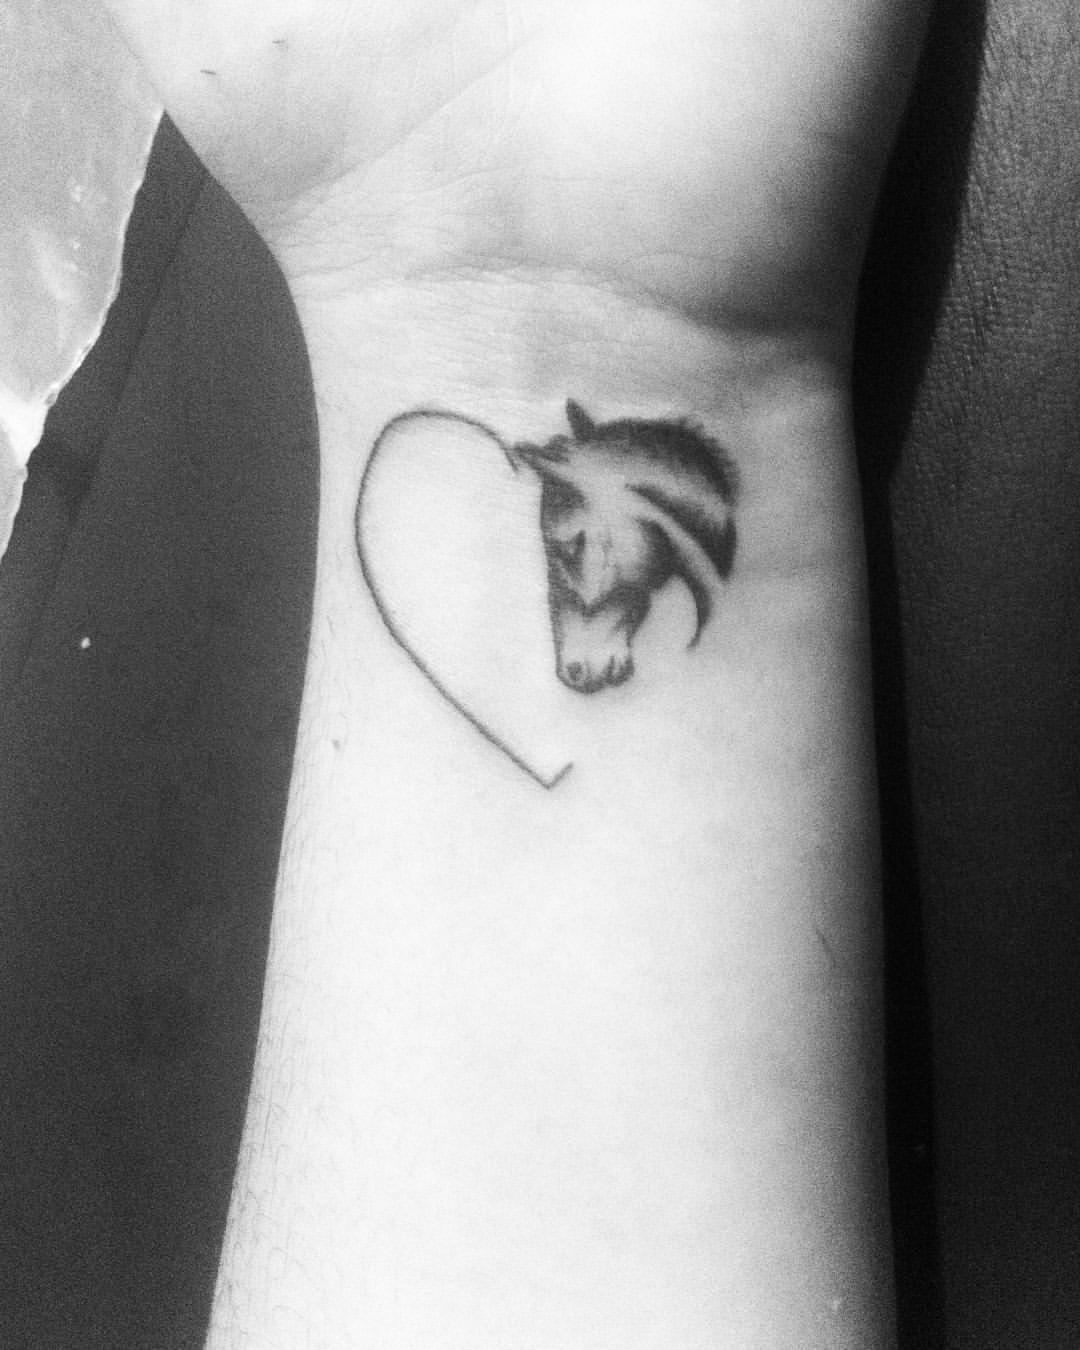 73 Ideas para Tatuajes de Caballos (+ Significados) 18